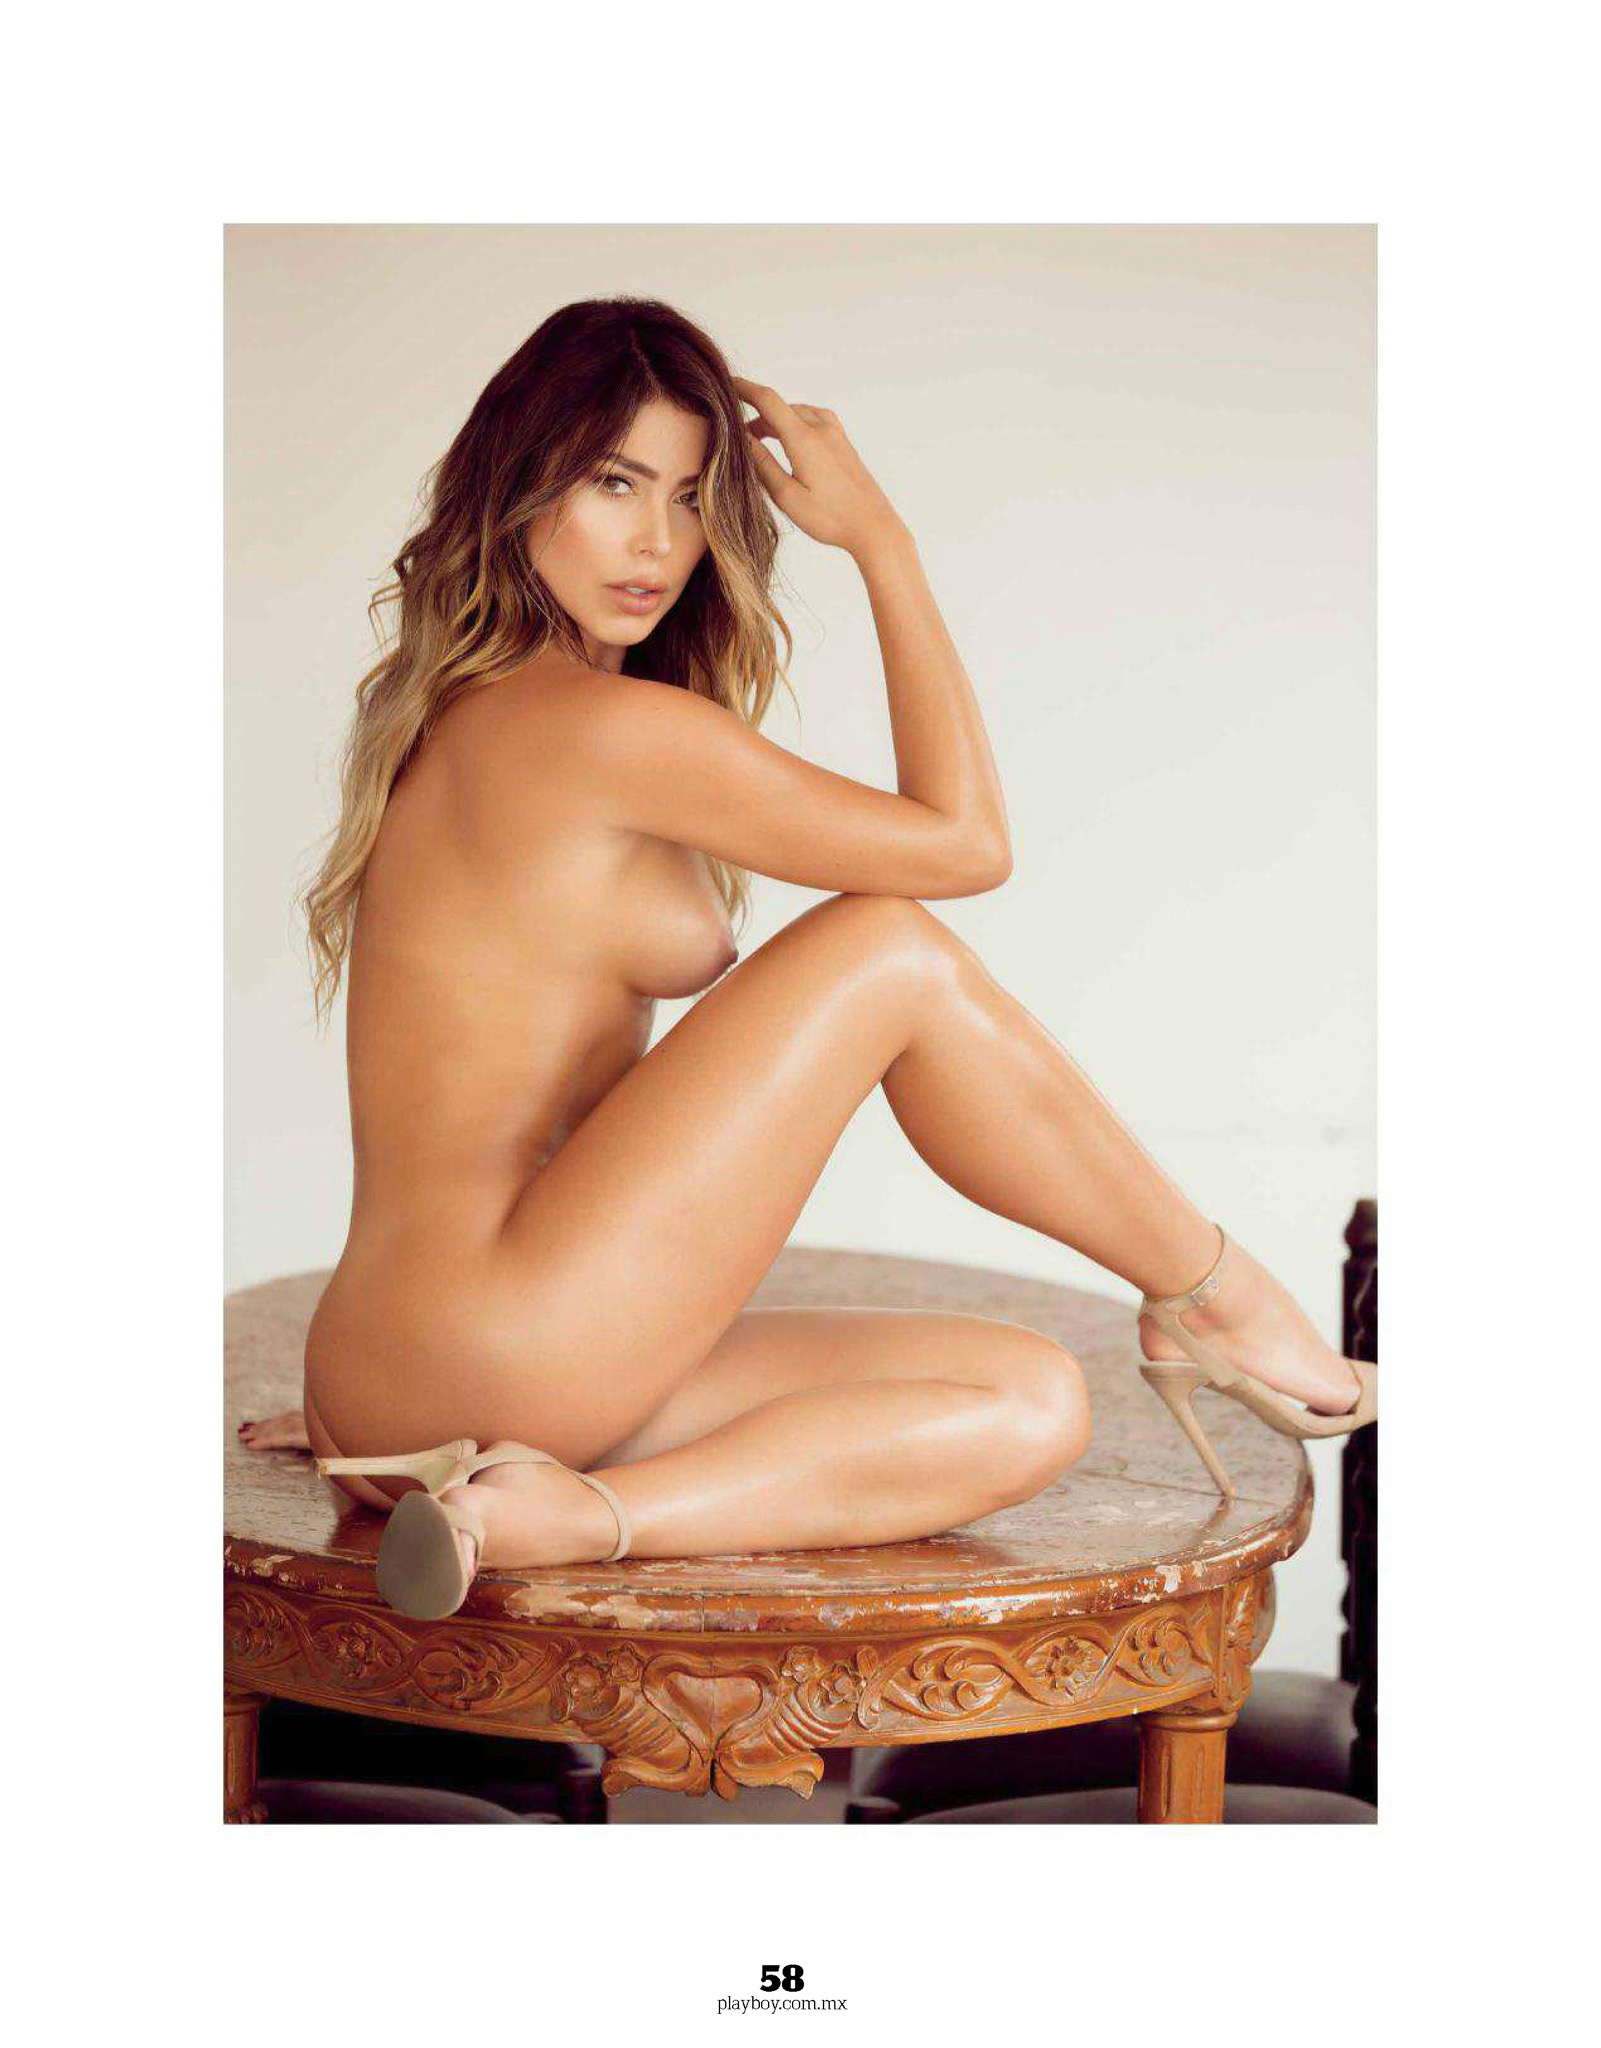 fabitogomez_201805-Playboy México-64.jpg